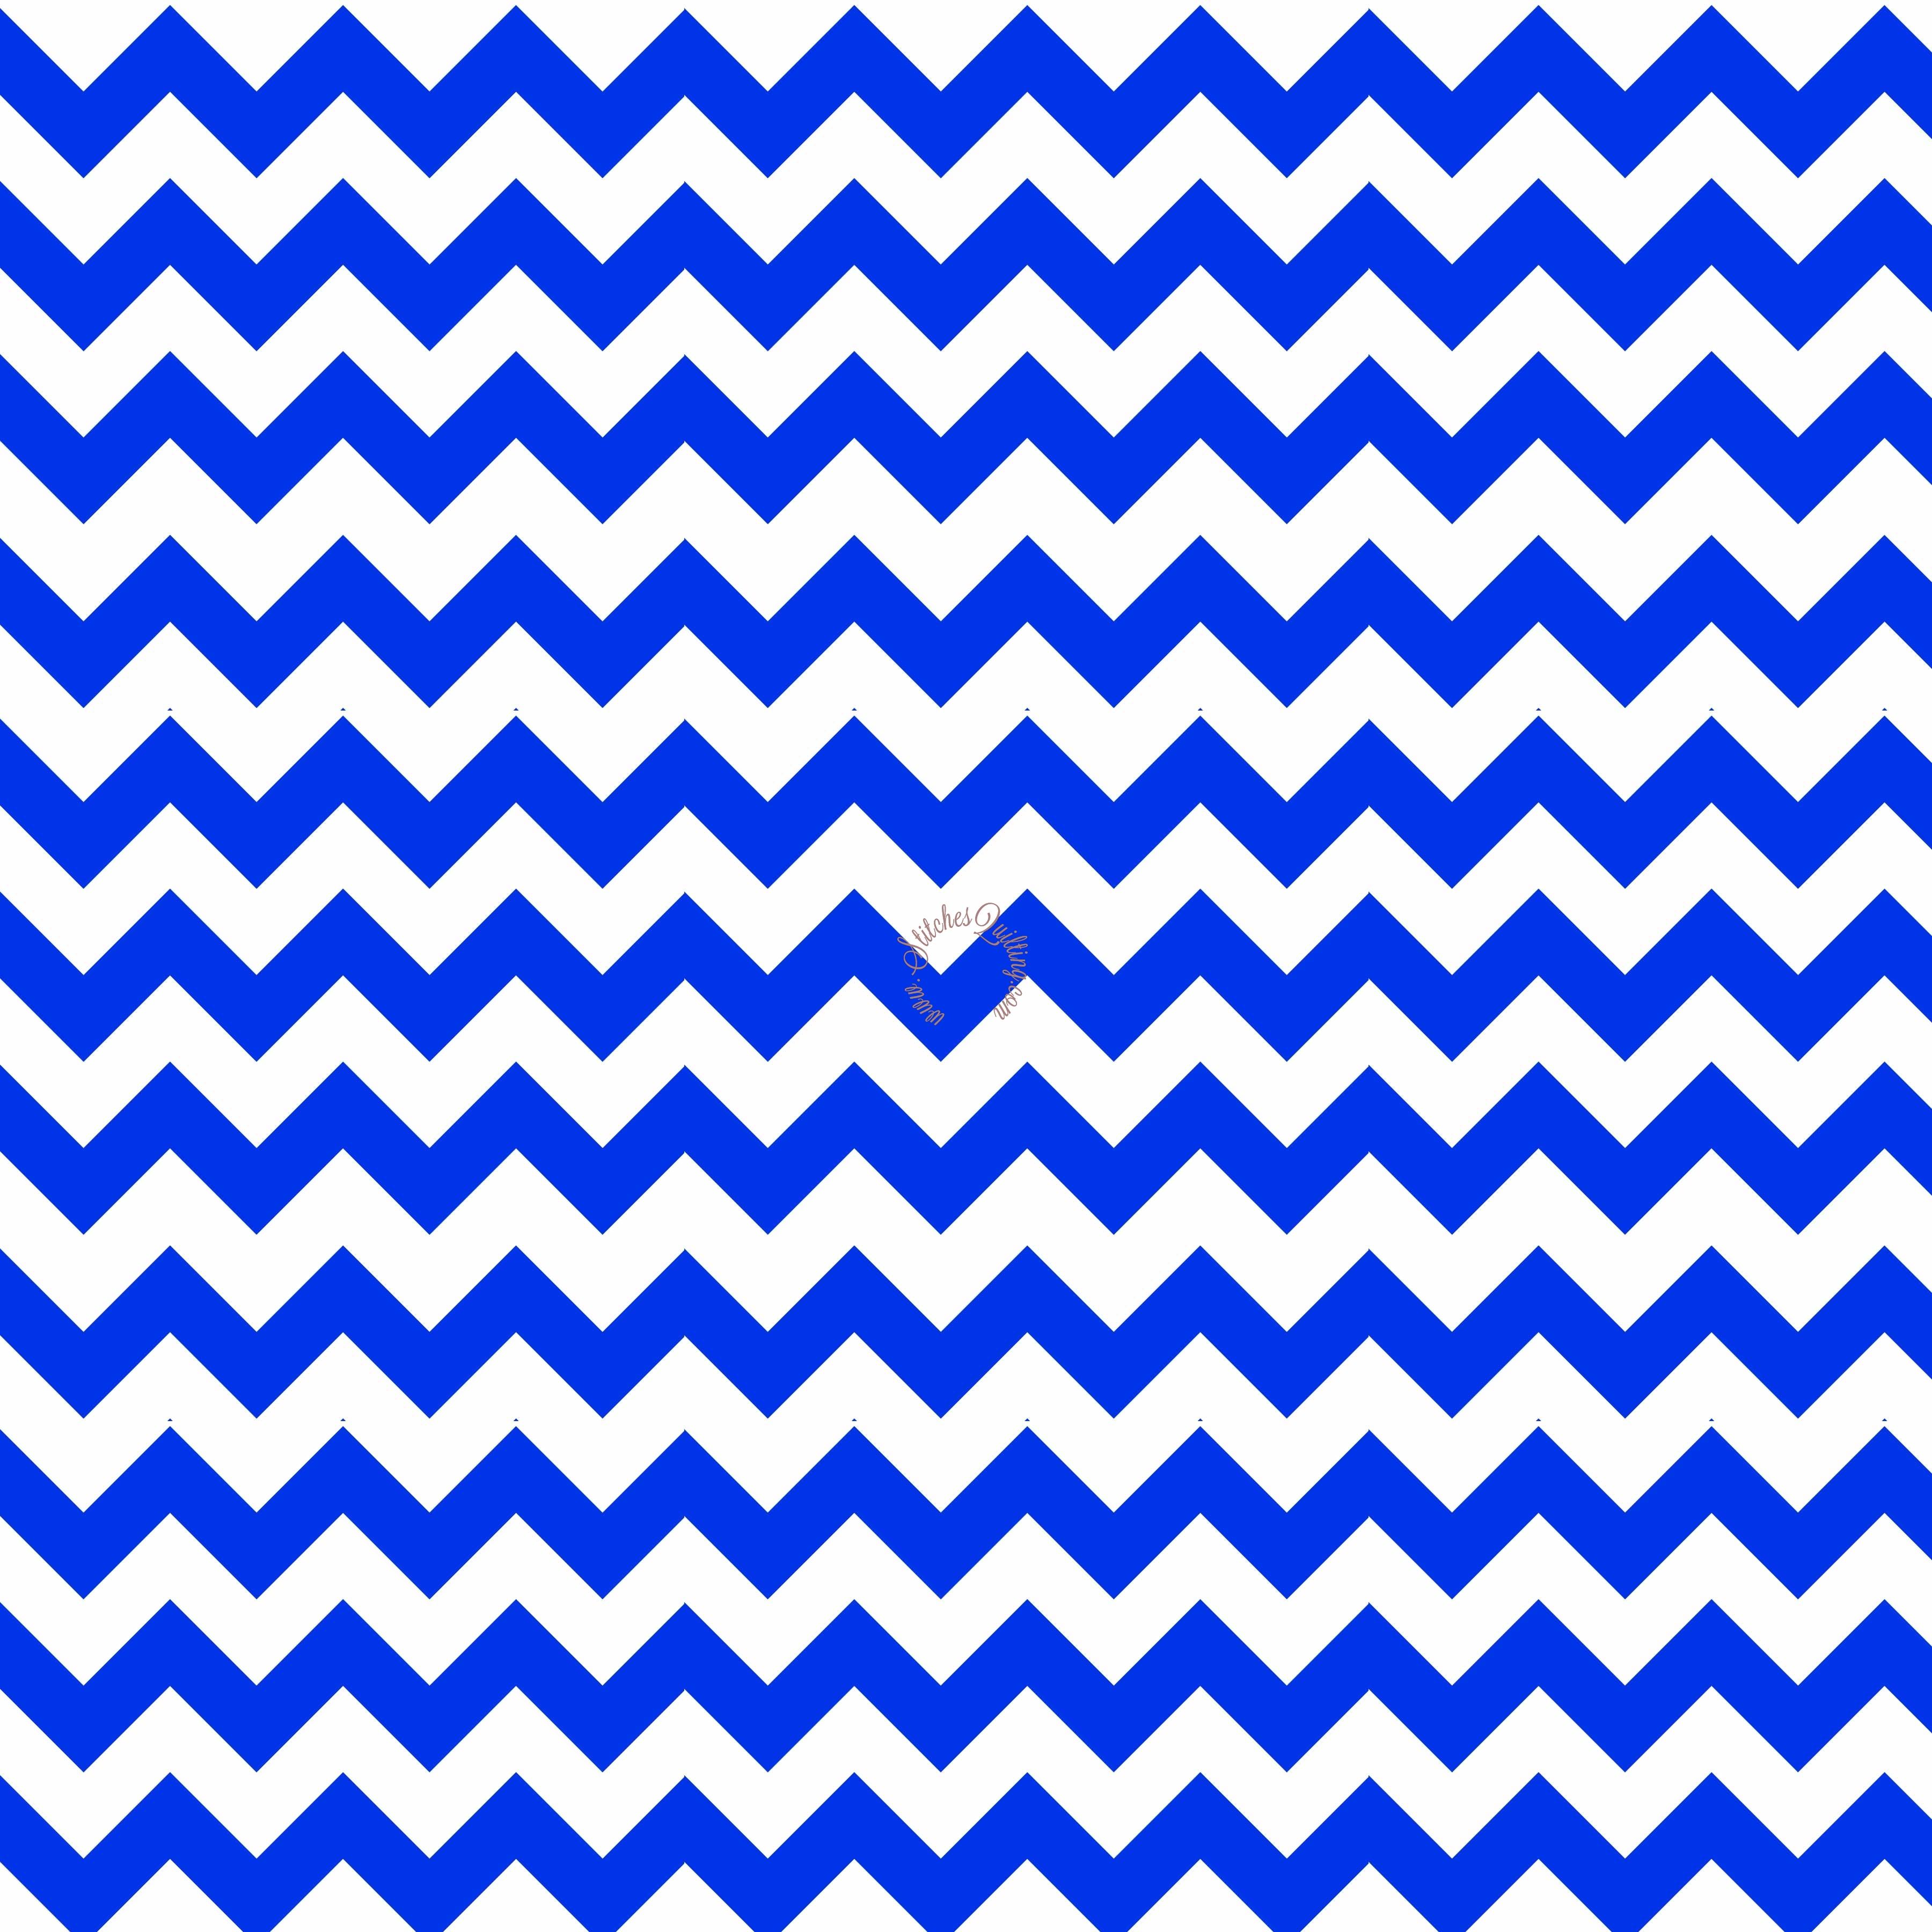 Royal Blue Small Chevron Fabric Riley Blake CC340-27 • Stitches ...